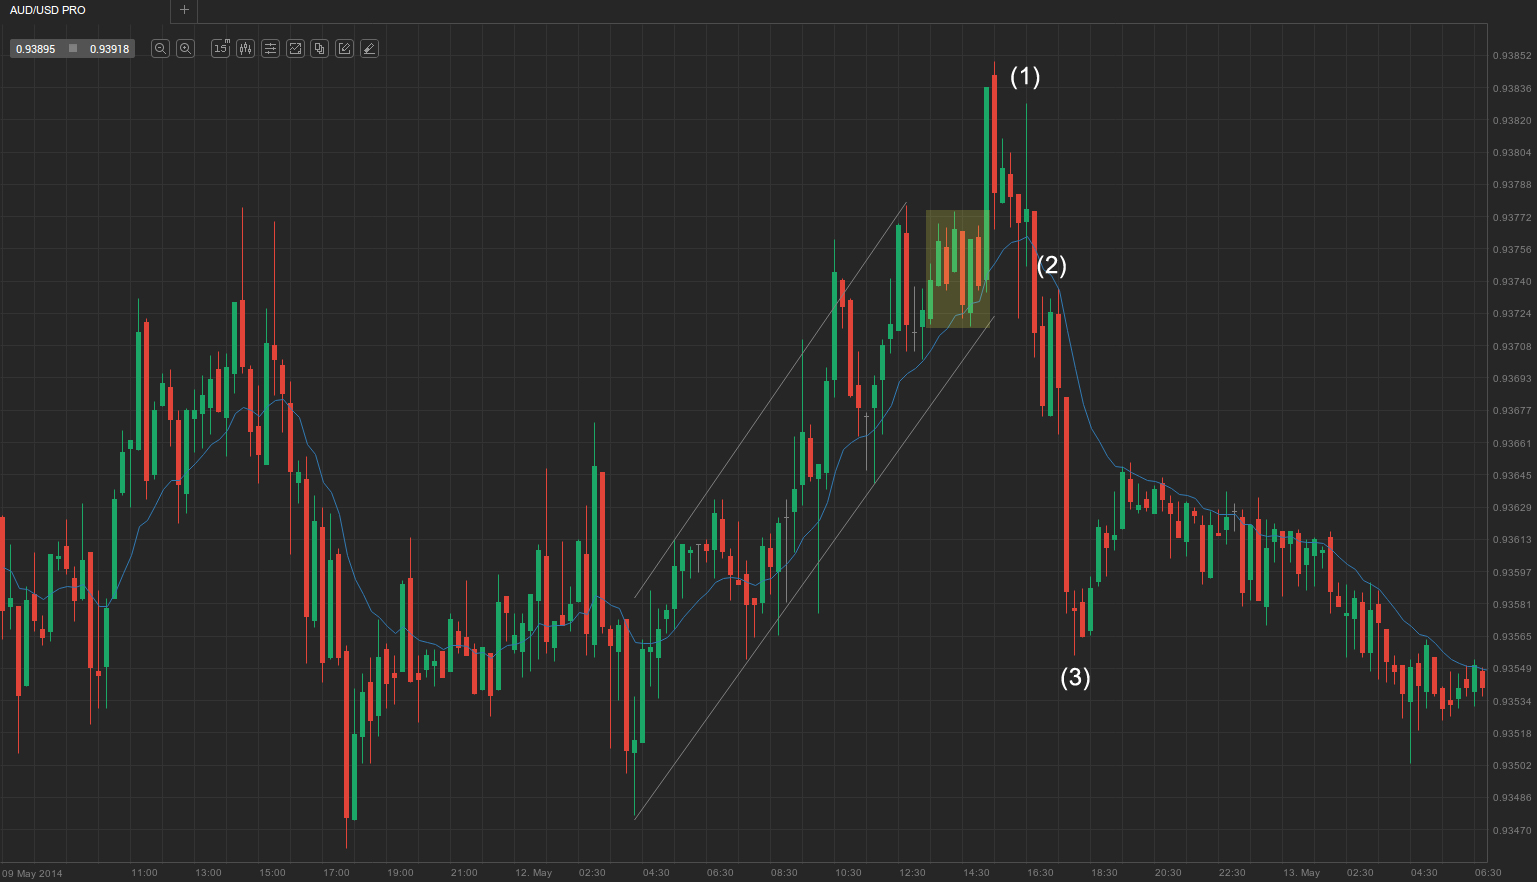 1. Failed final flag trading range